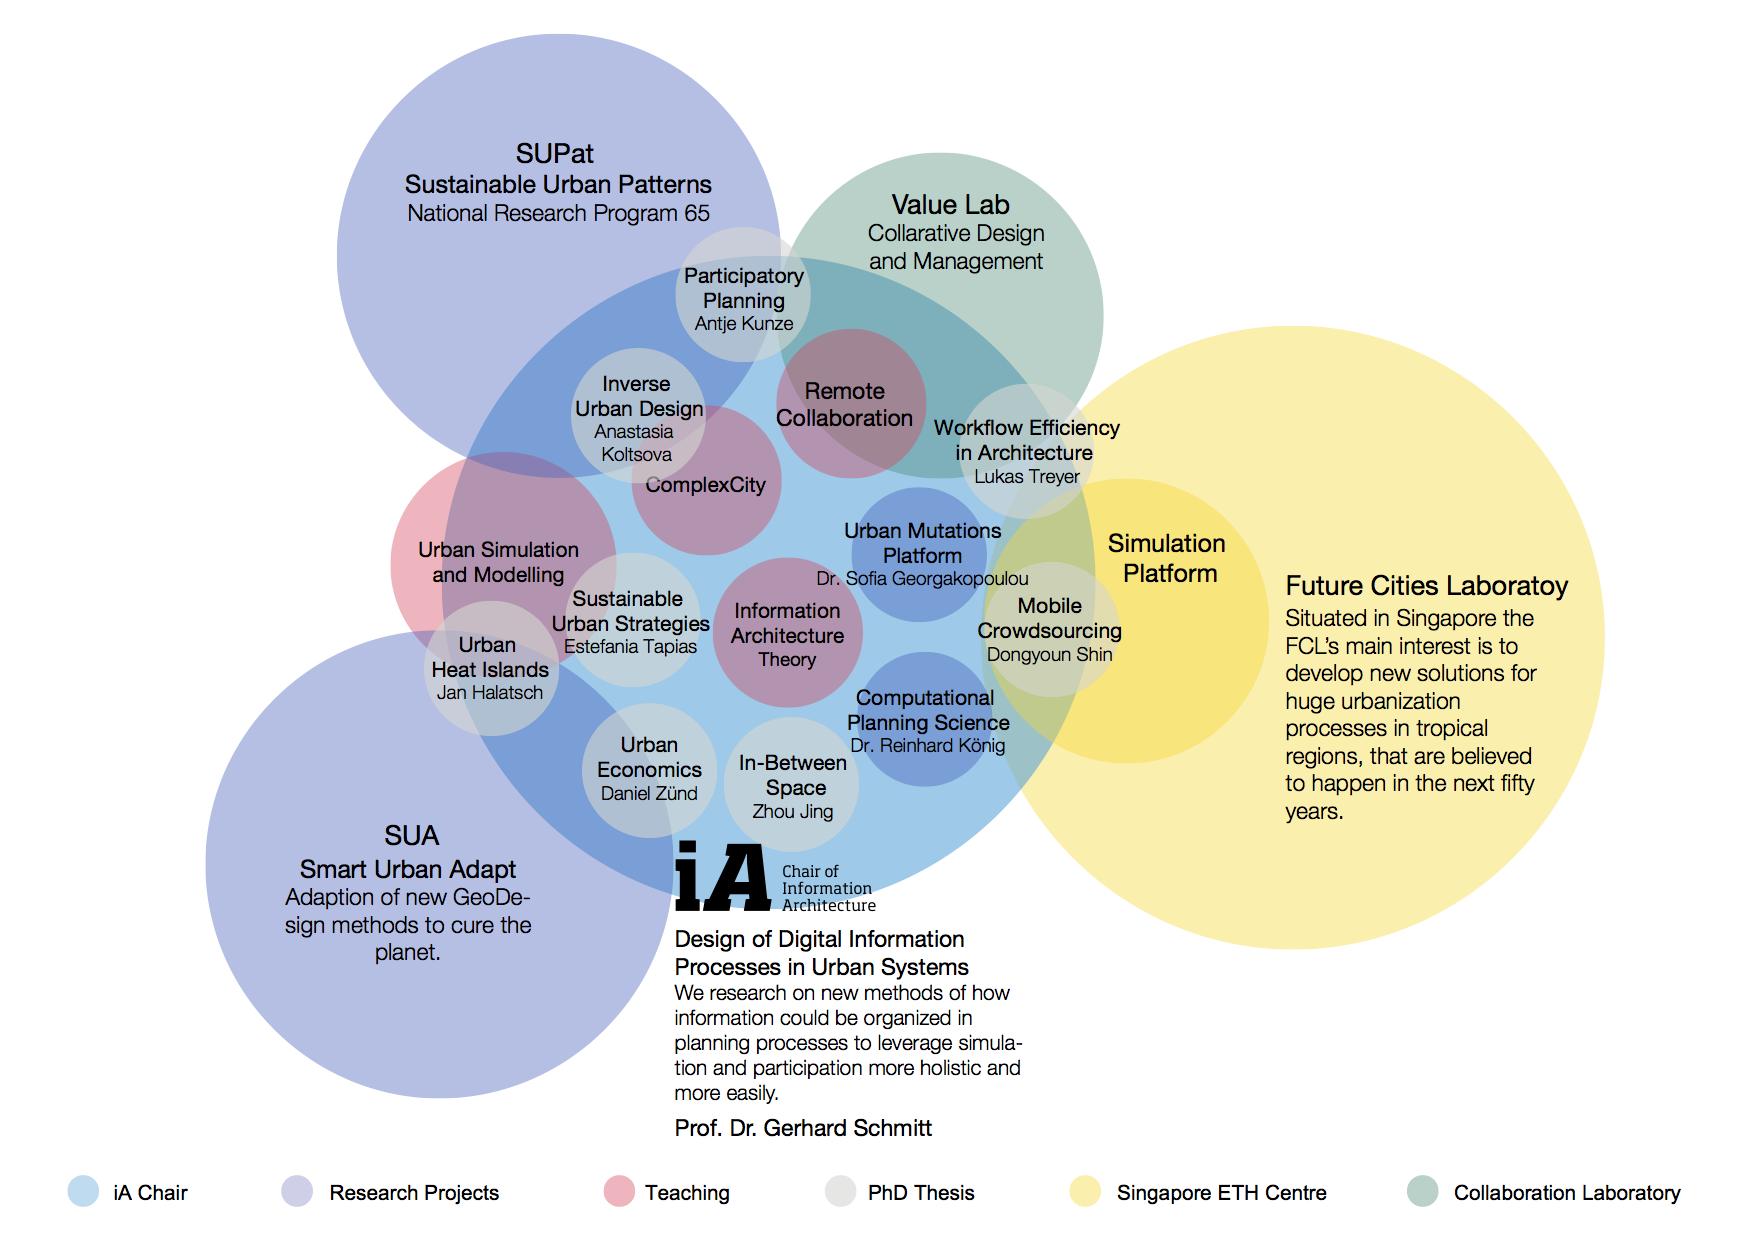 architecture diagrams  information architecture and architecture    architecture diagrams  information architecture and architecture on pinterest